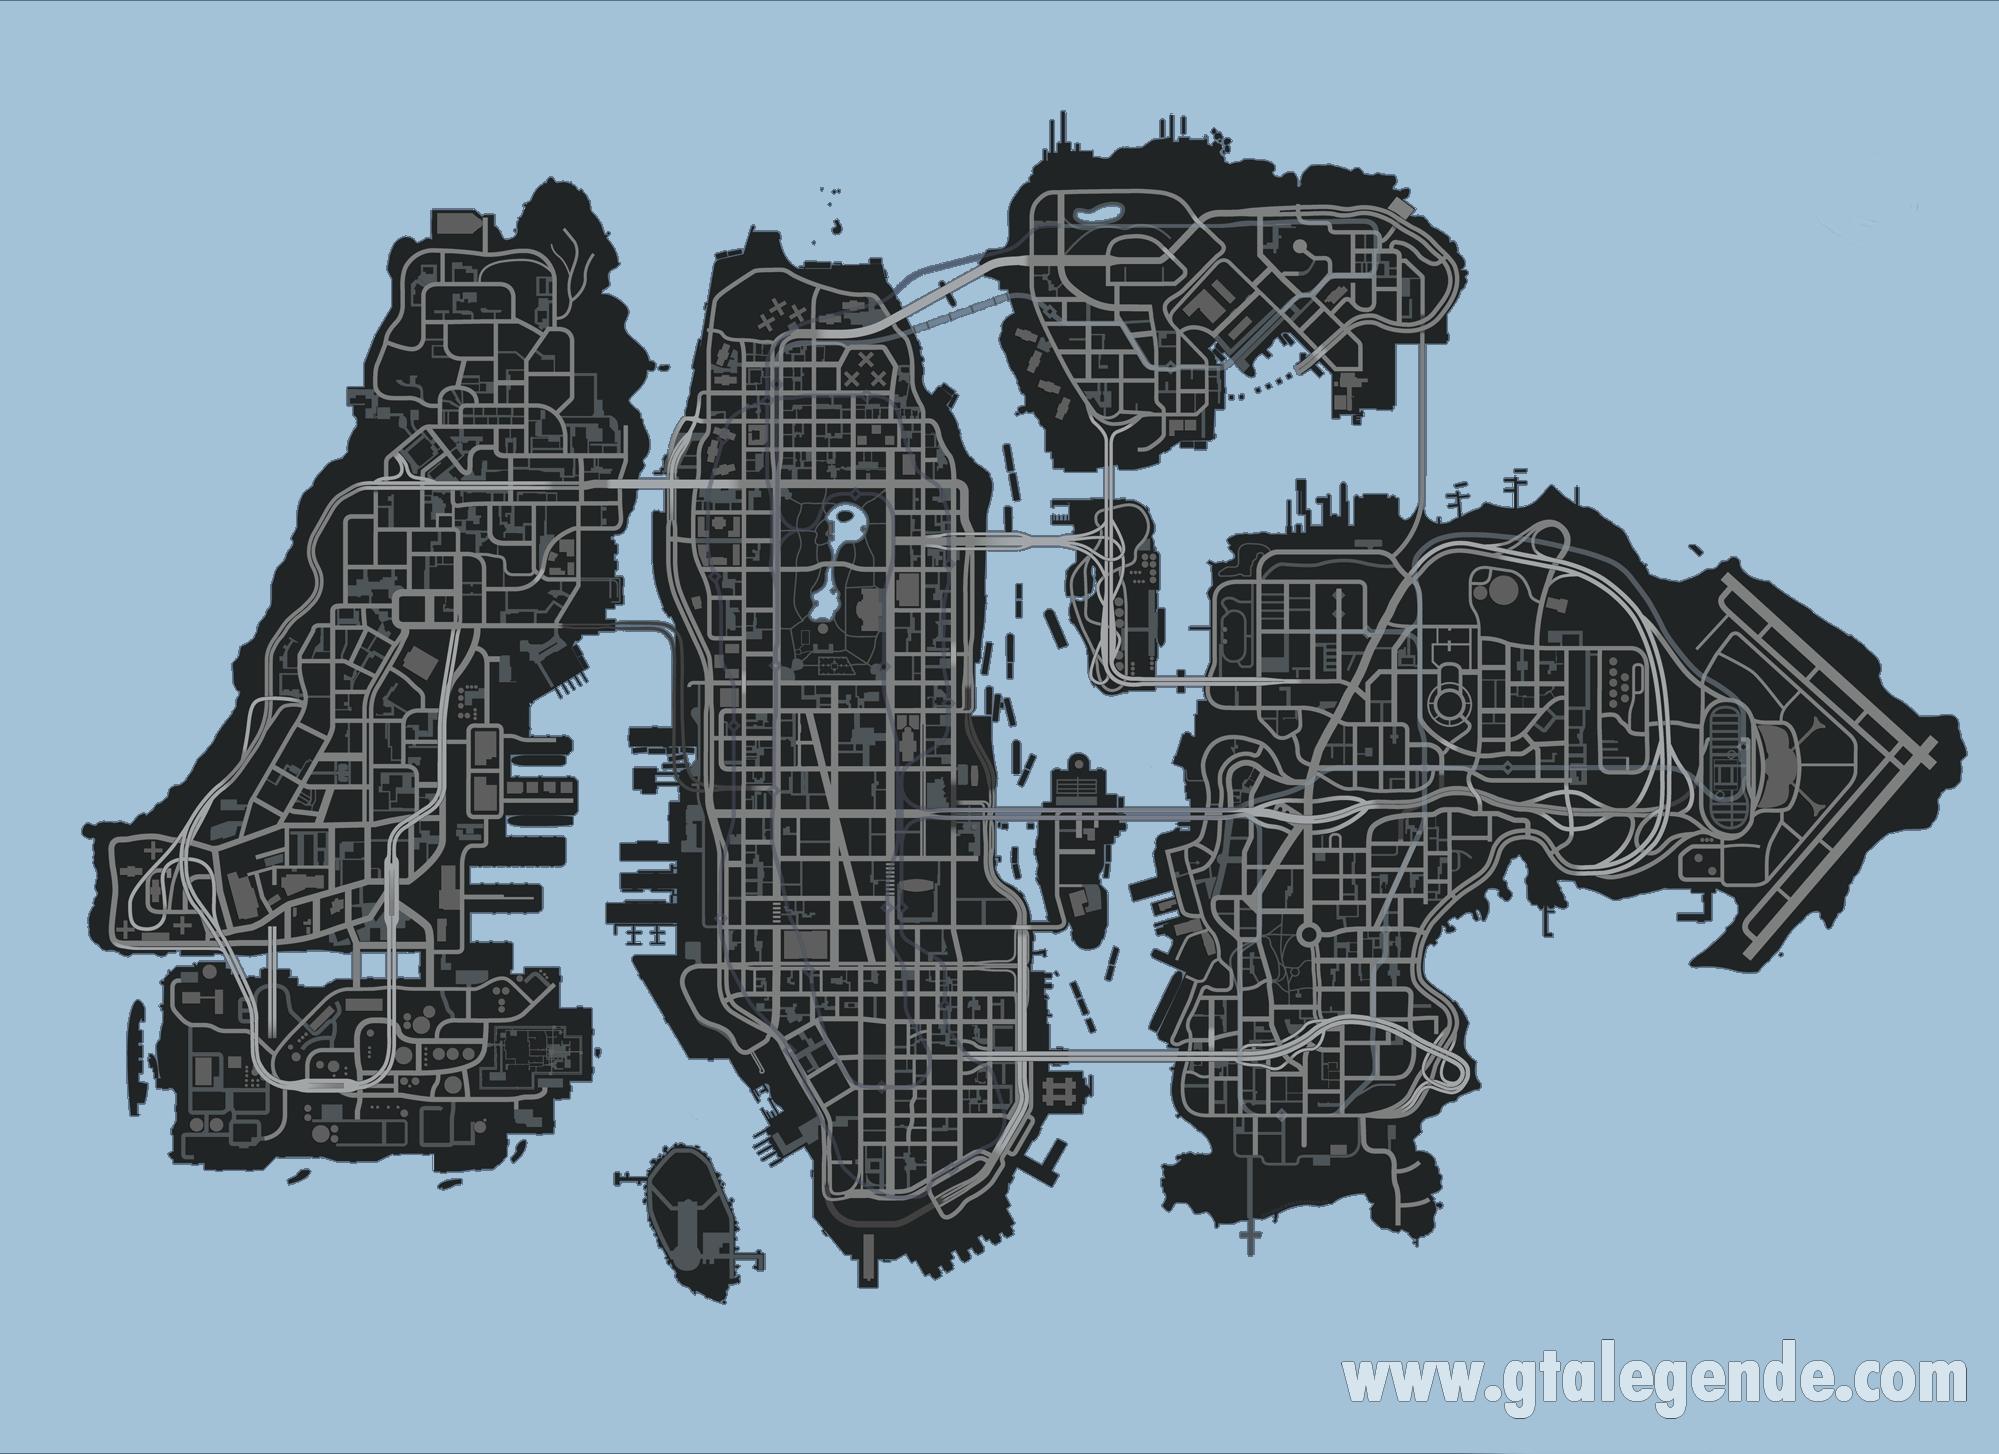 Grand Theft Auto IV Wikip dia